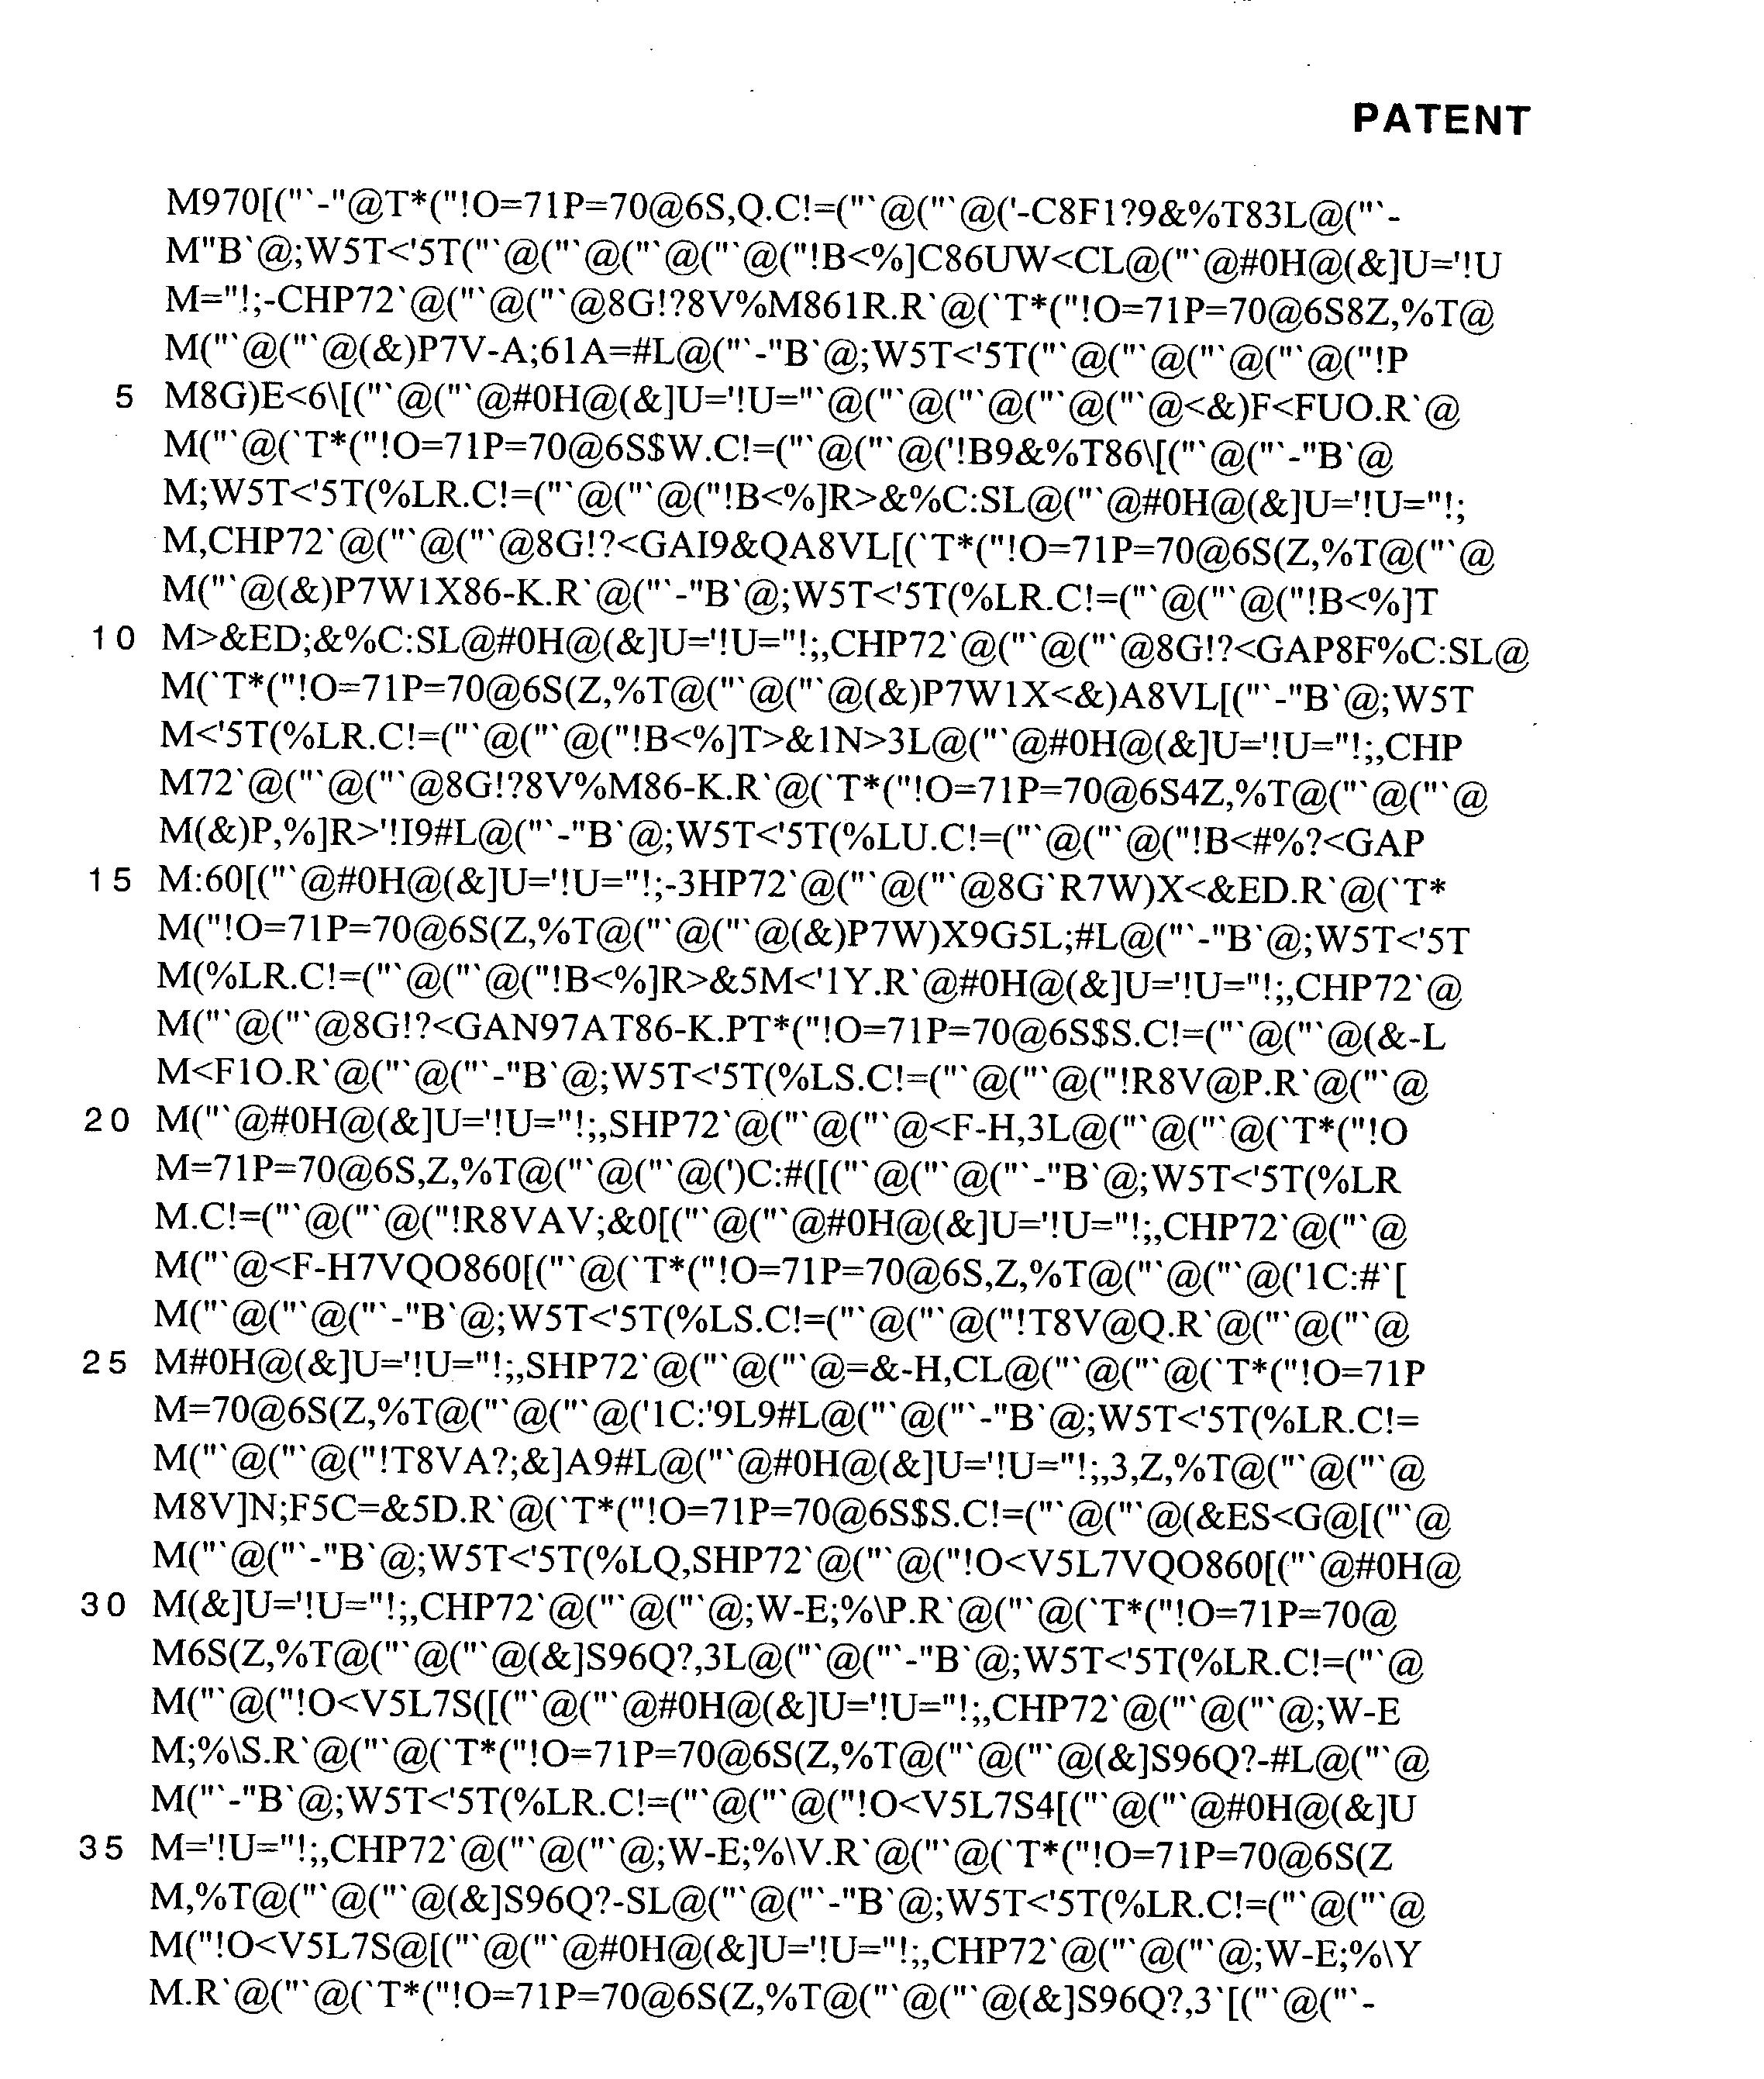 Figure US20030174721A1-20030918-P00069